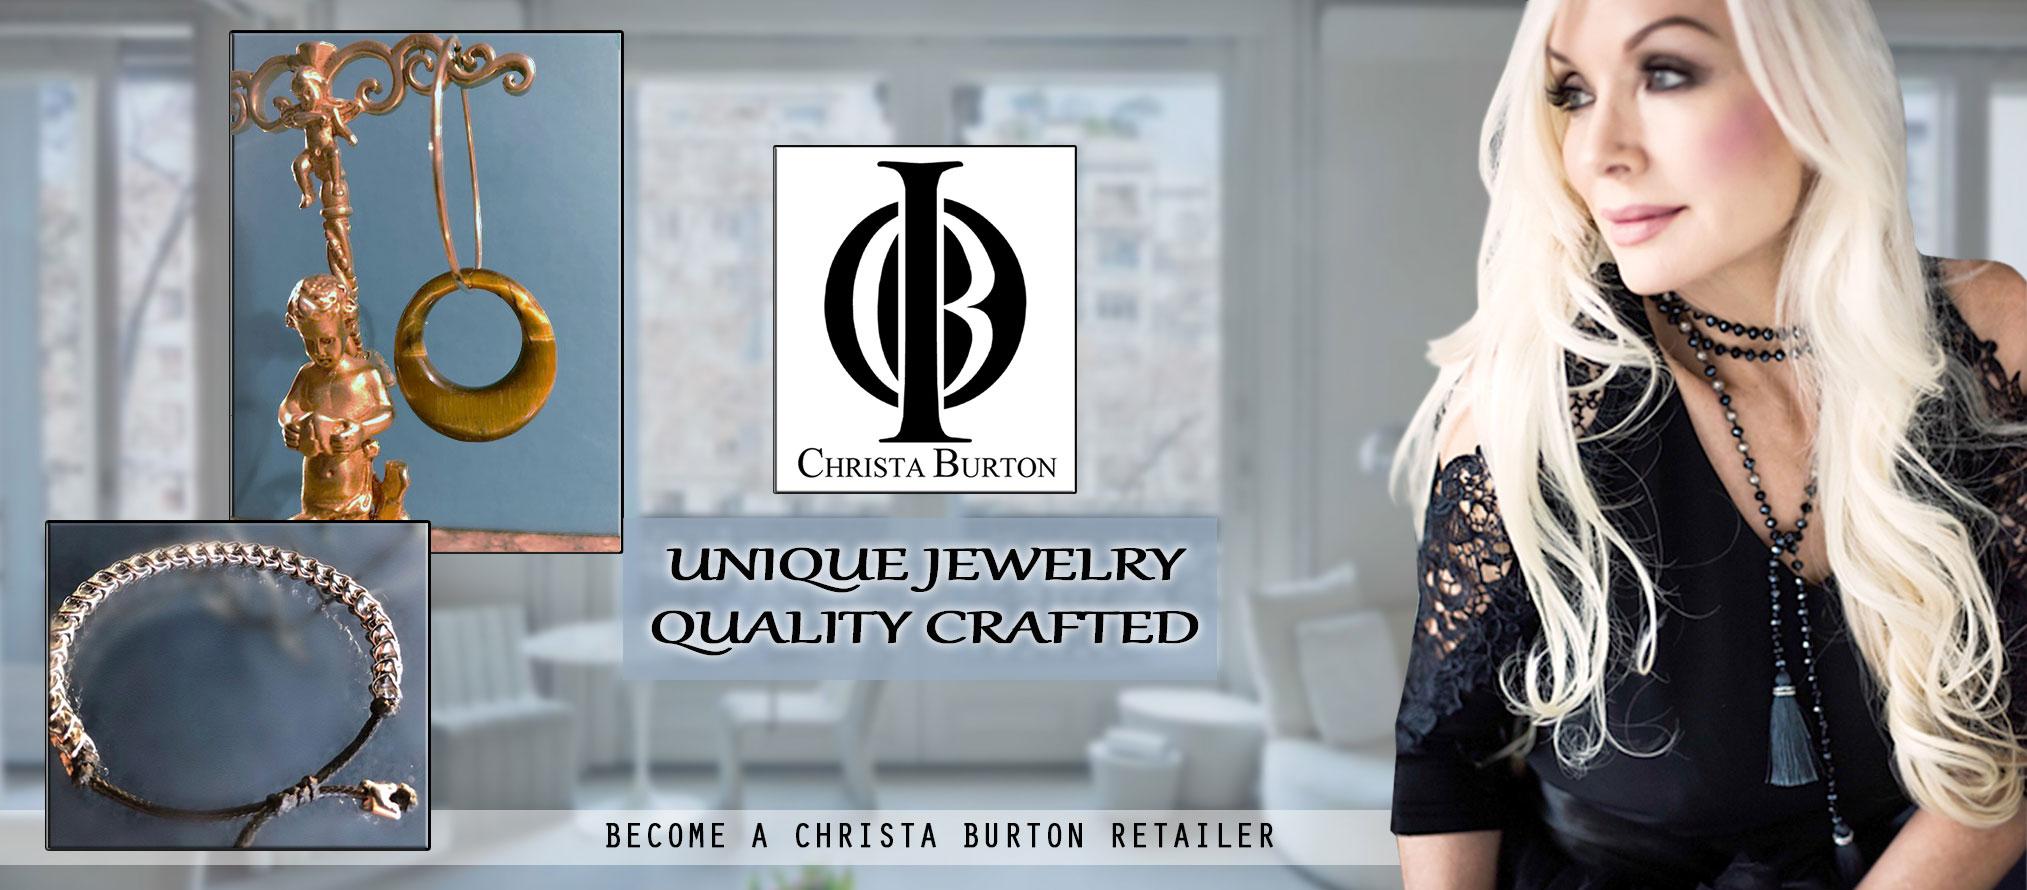 Christa Burton